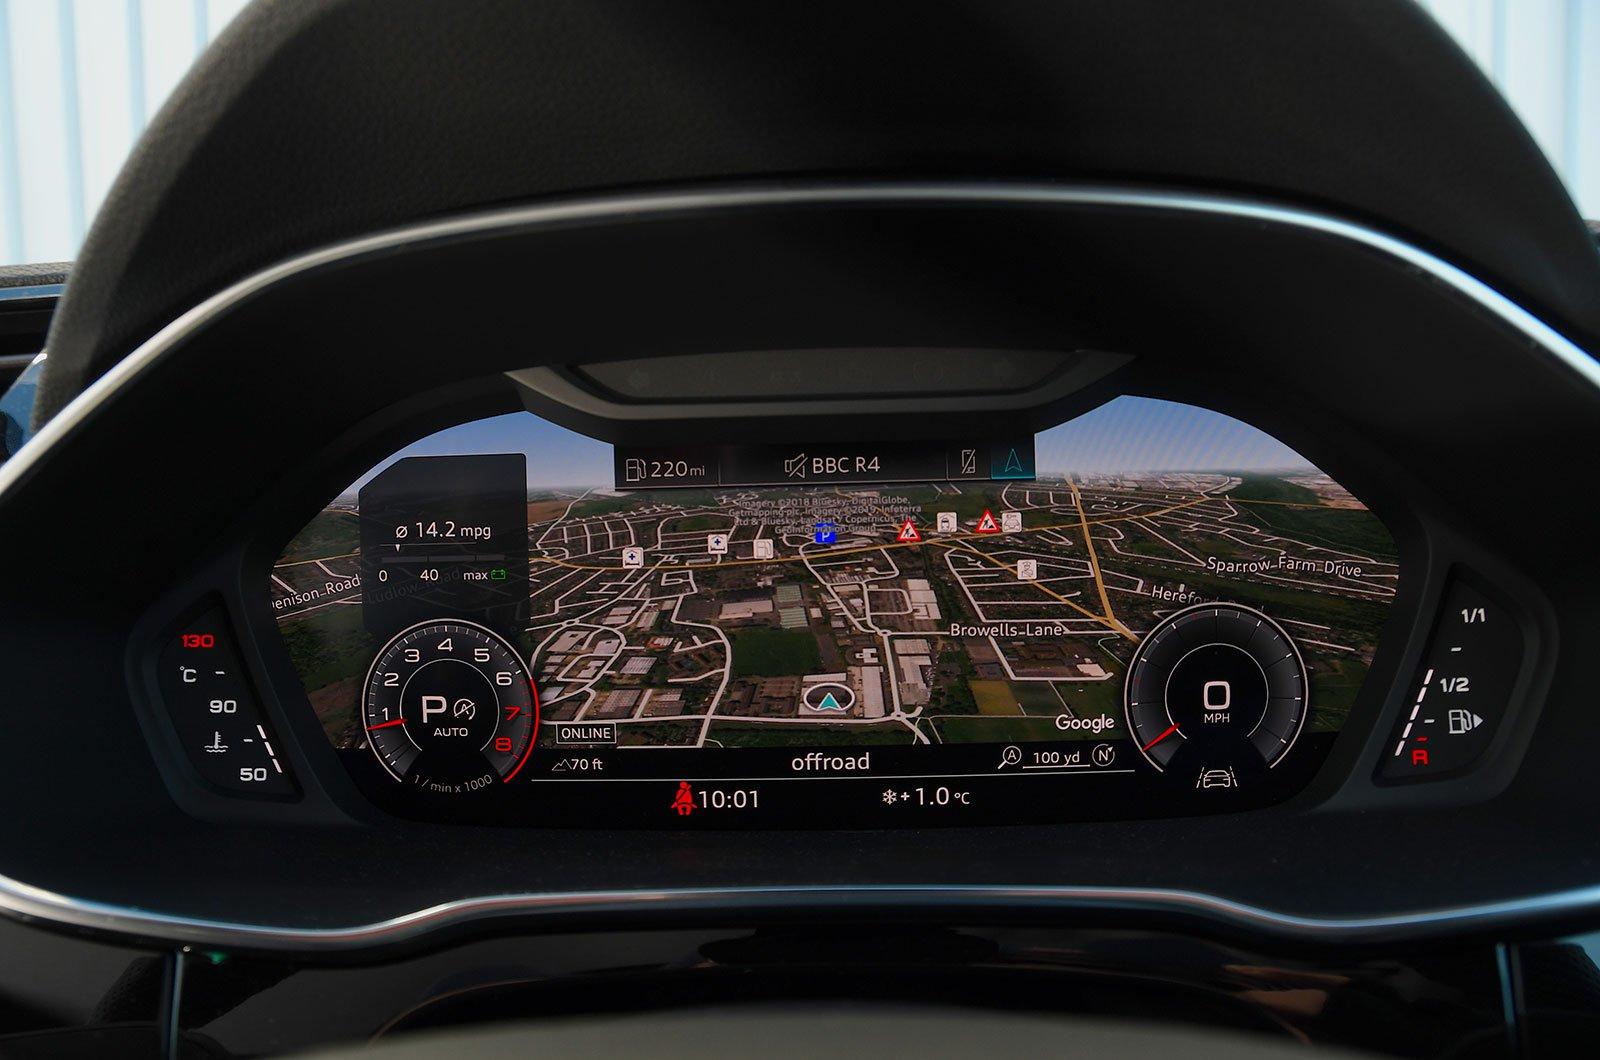 Audi Q3 infotainment screen